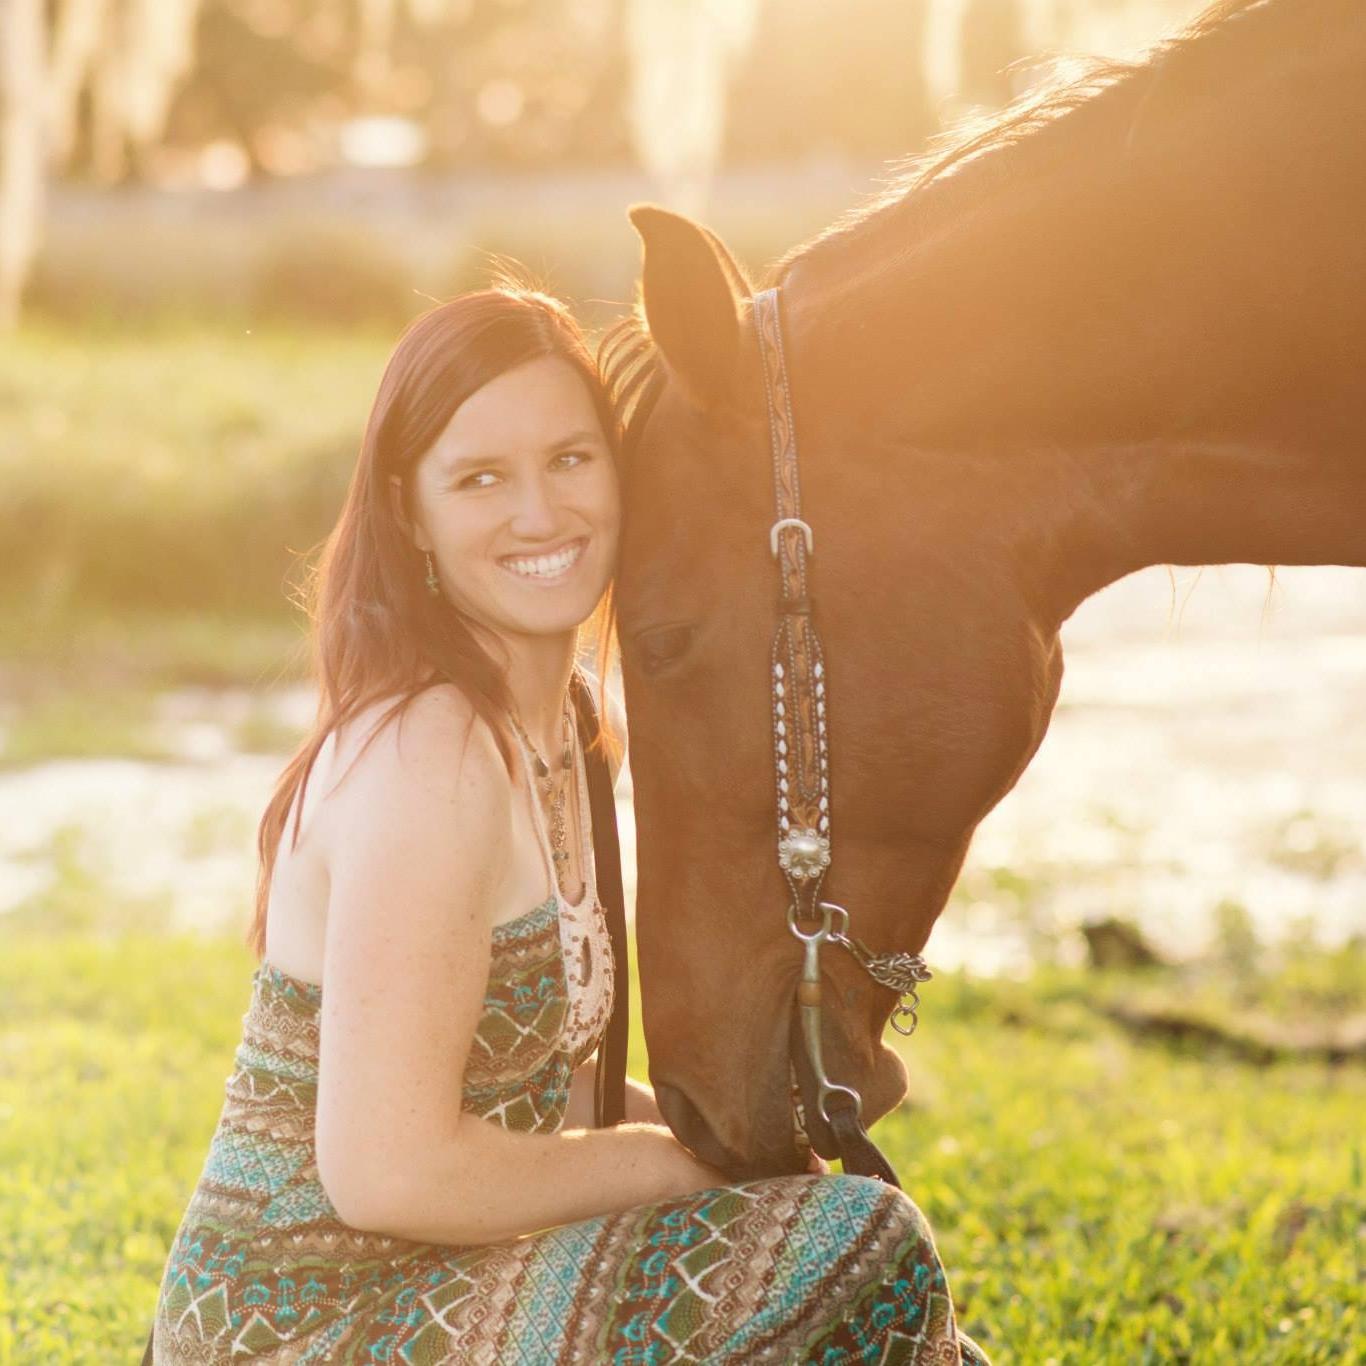 Lisa McCoy  Genre |Equestrian, Portraits, Cars/Yachts  | Based in Tampa, FL